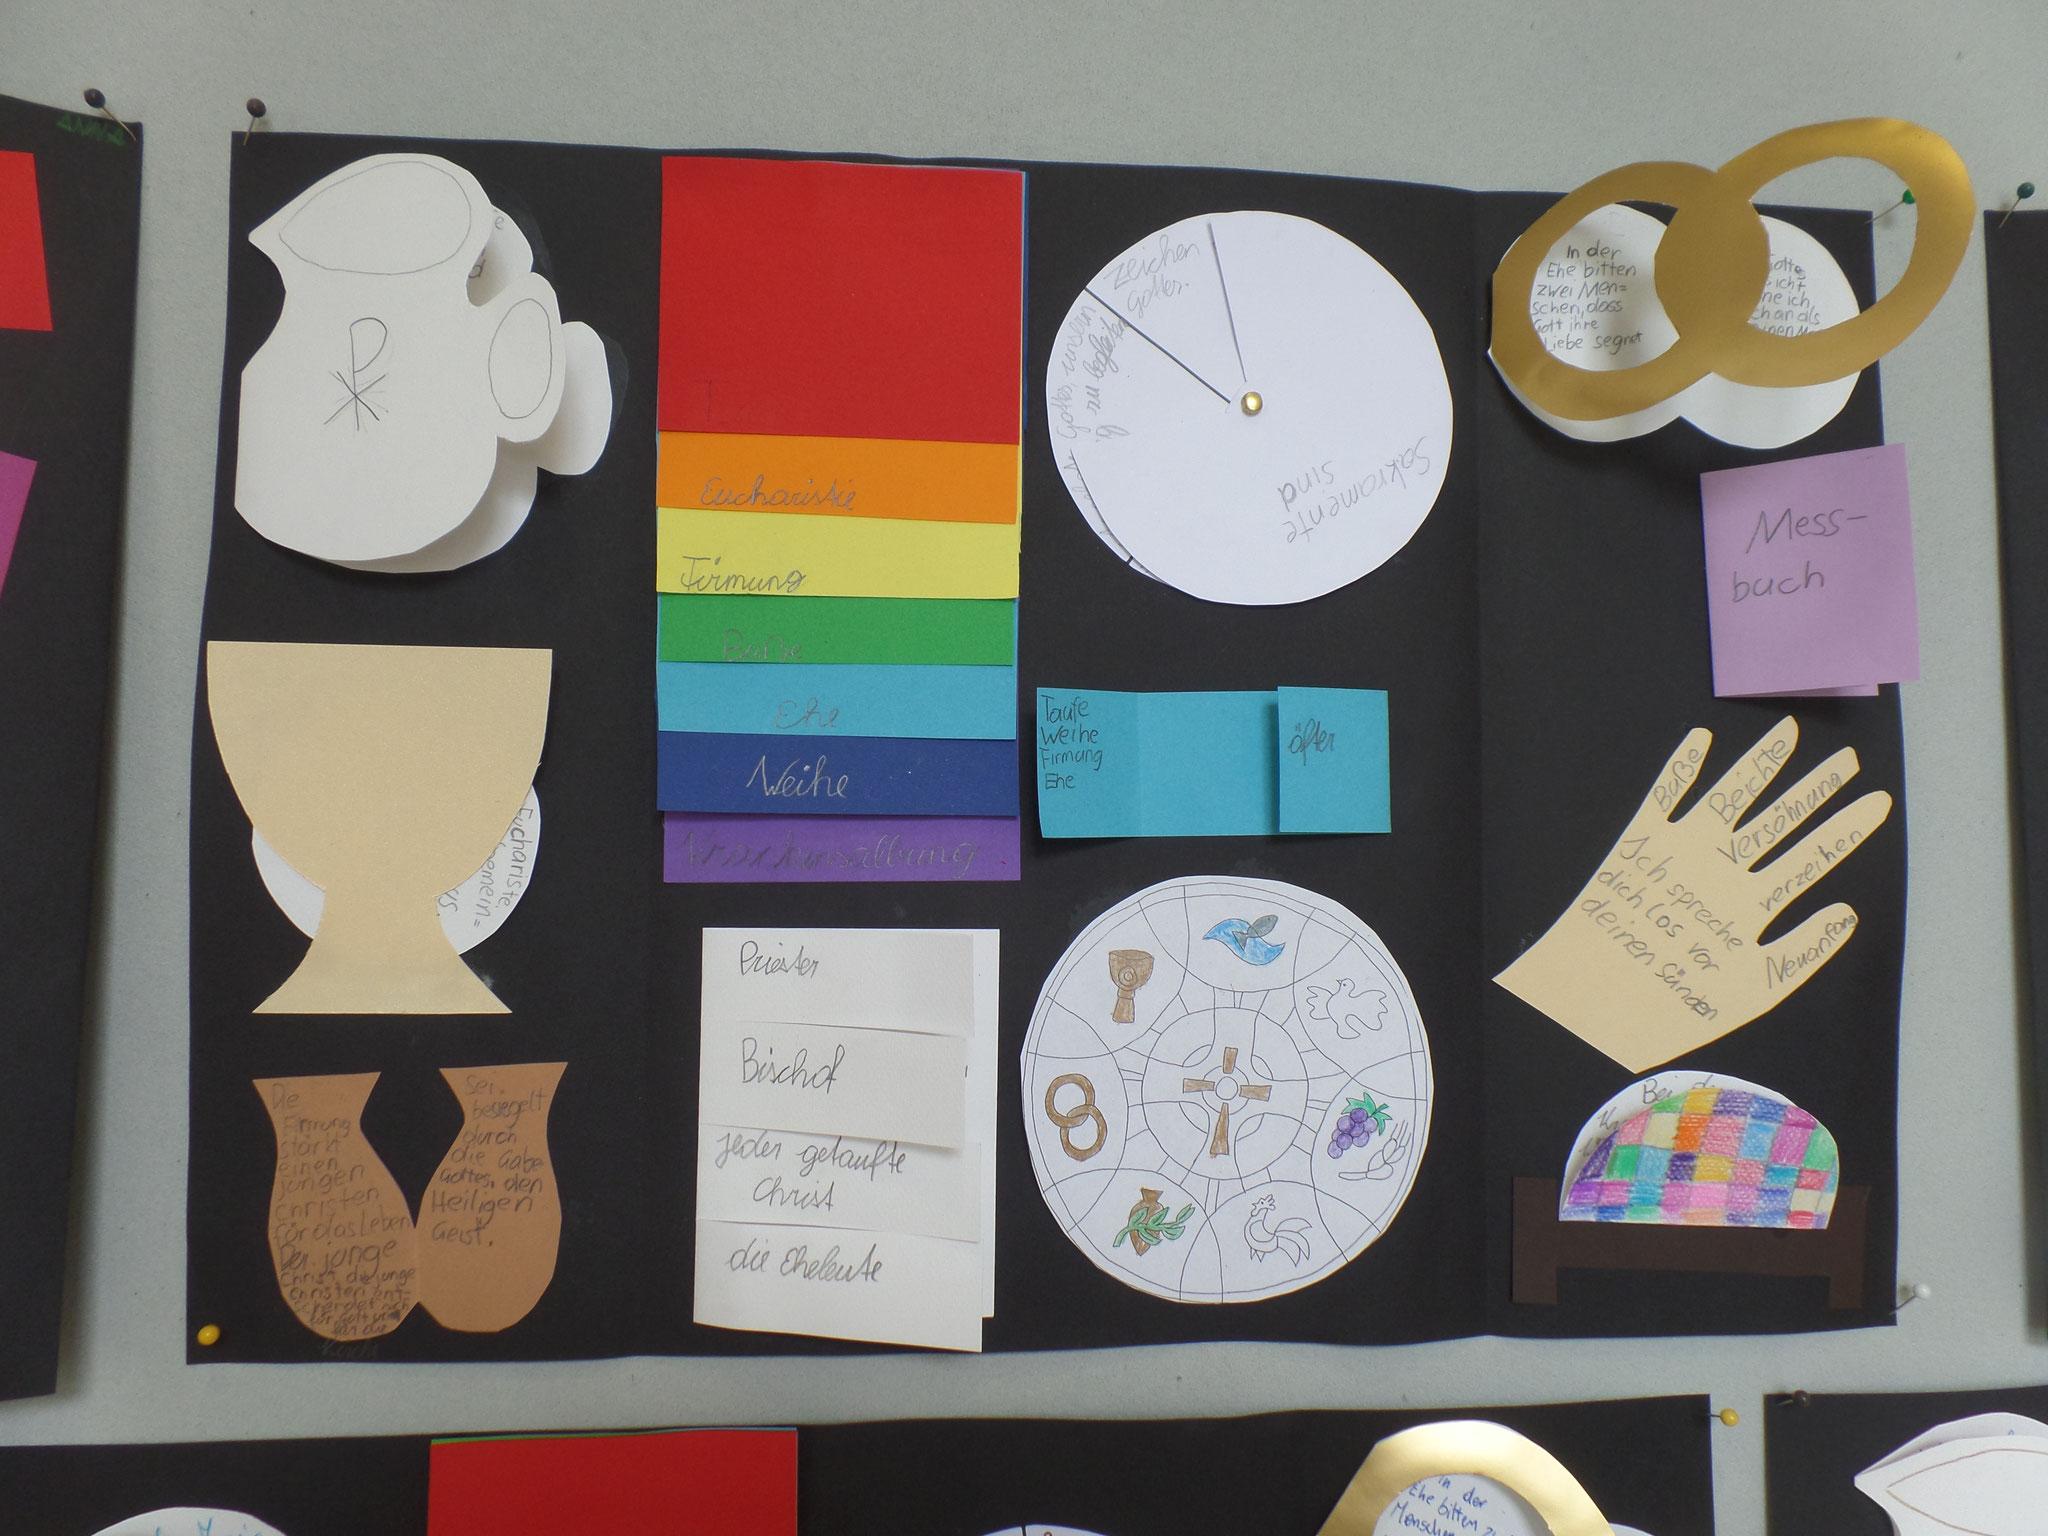 Kreative Unterrichts- und Projektideen - gudelongs Webseite